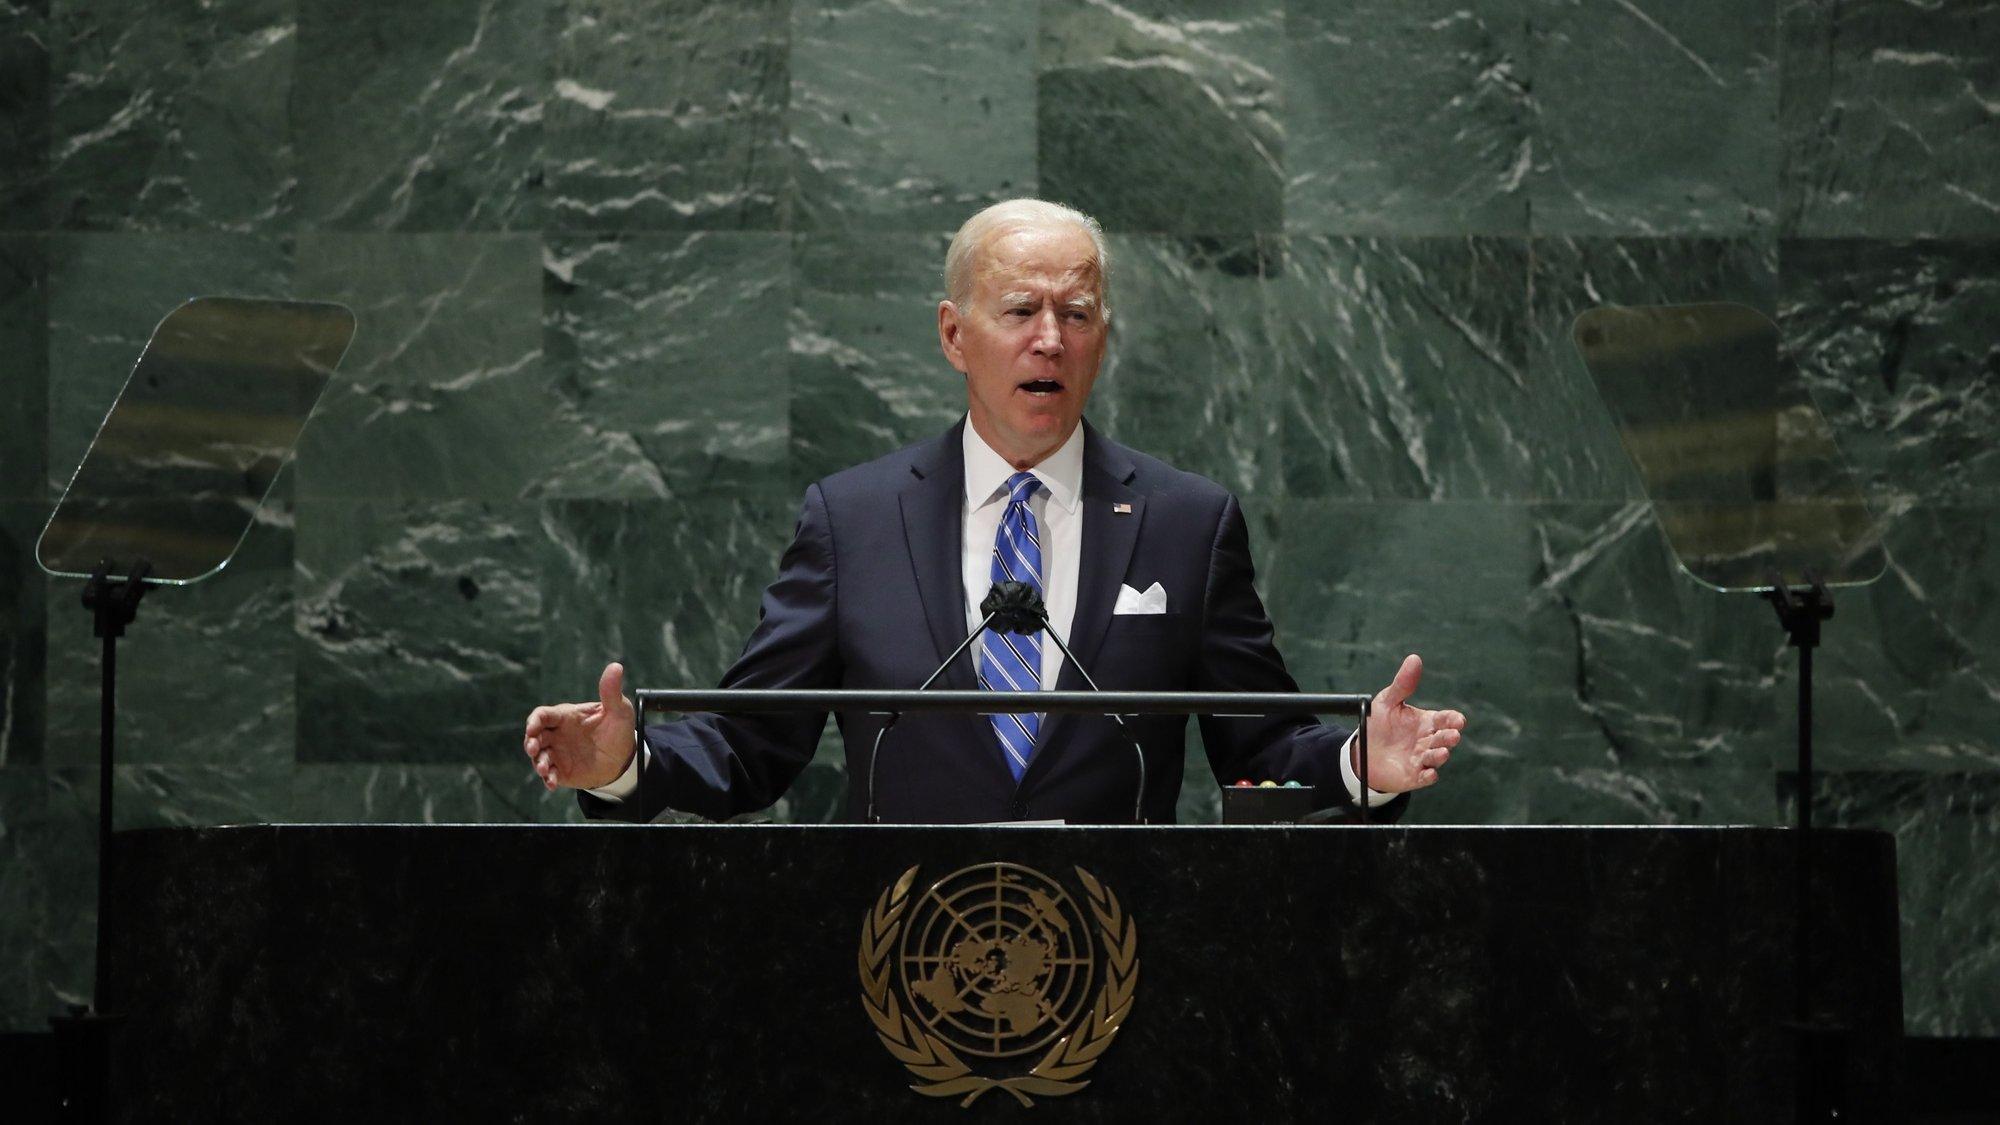 epa09479495 US President Joe Biden addresses the 76th Session of the UN General Assembly in New York City, USA, 21 September 2021.  EPA/EDUARDO MUNOZ / POOL